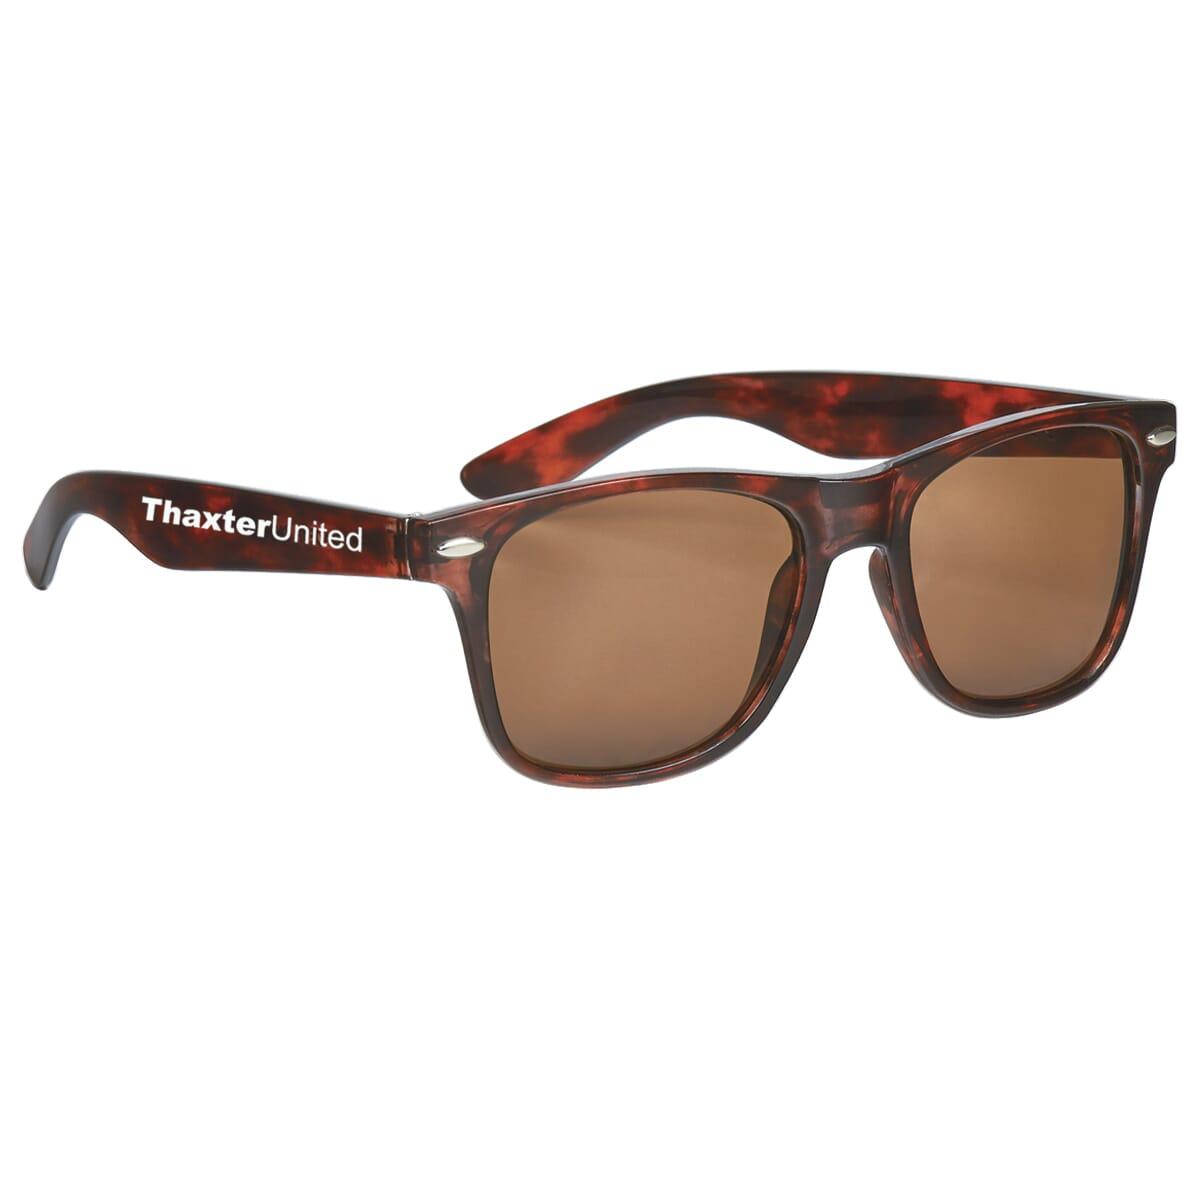 Retro style tortois shell sunglasses